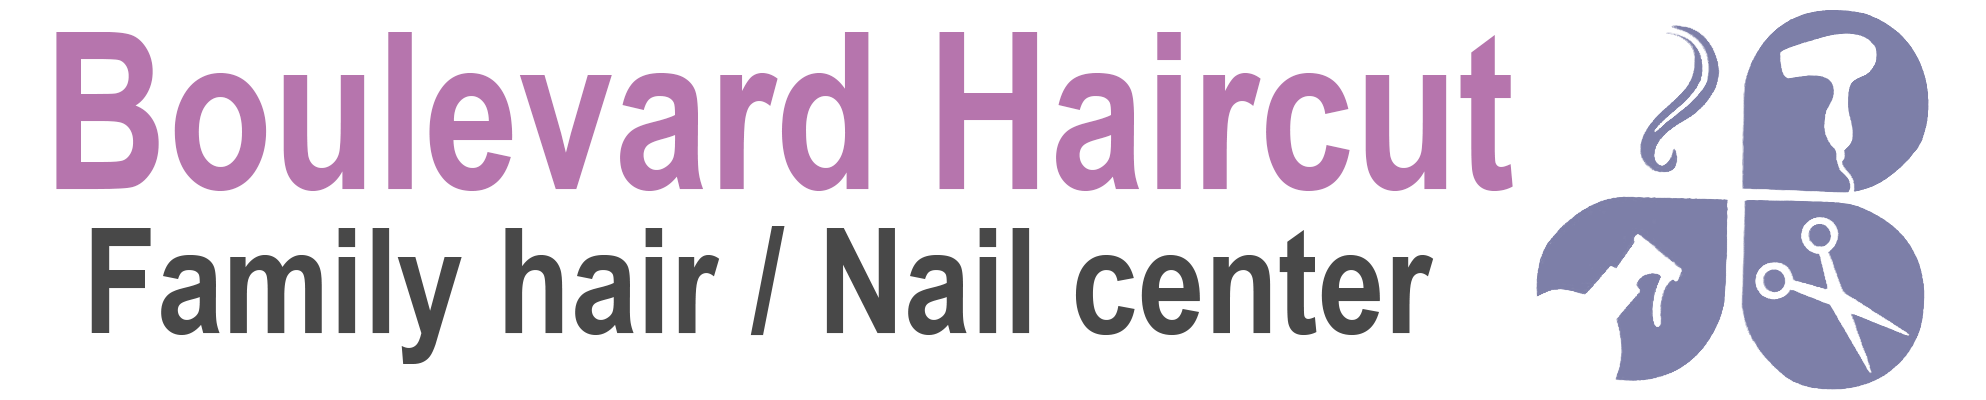 Boulevard Haircuts